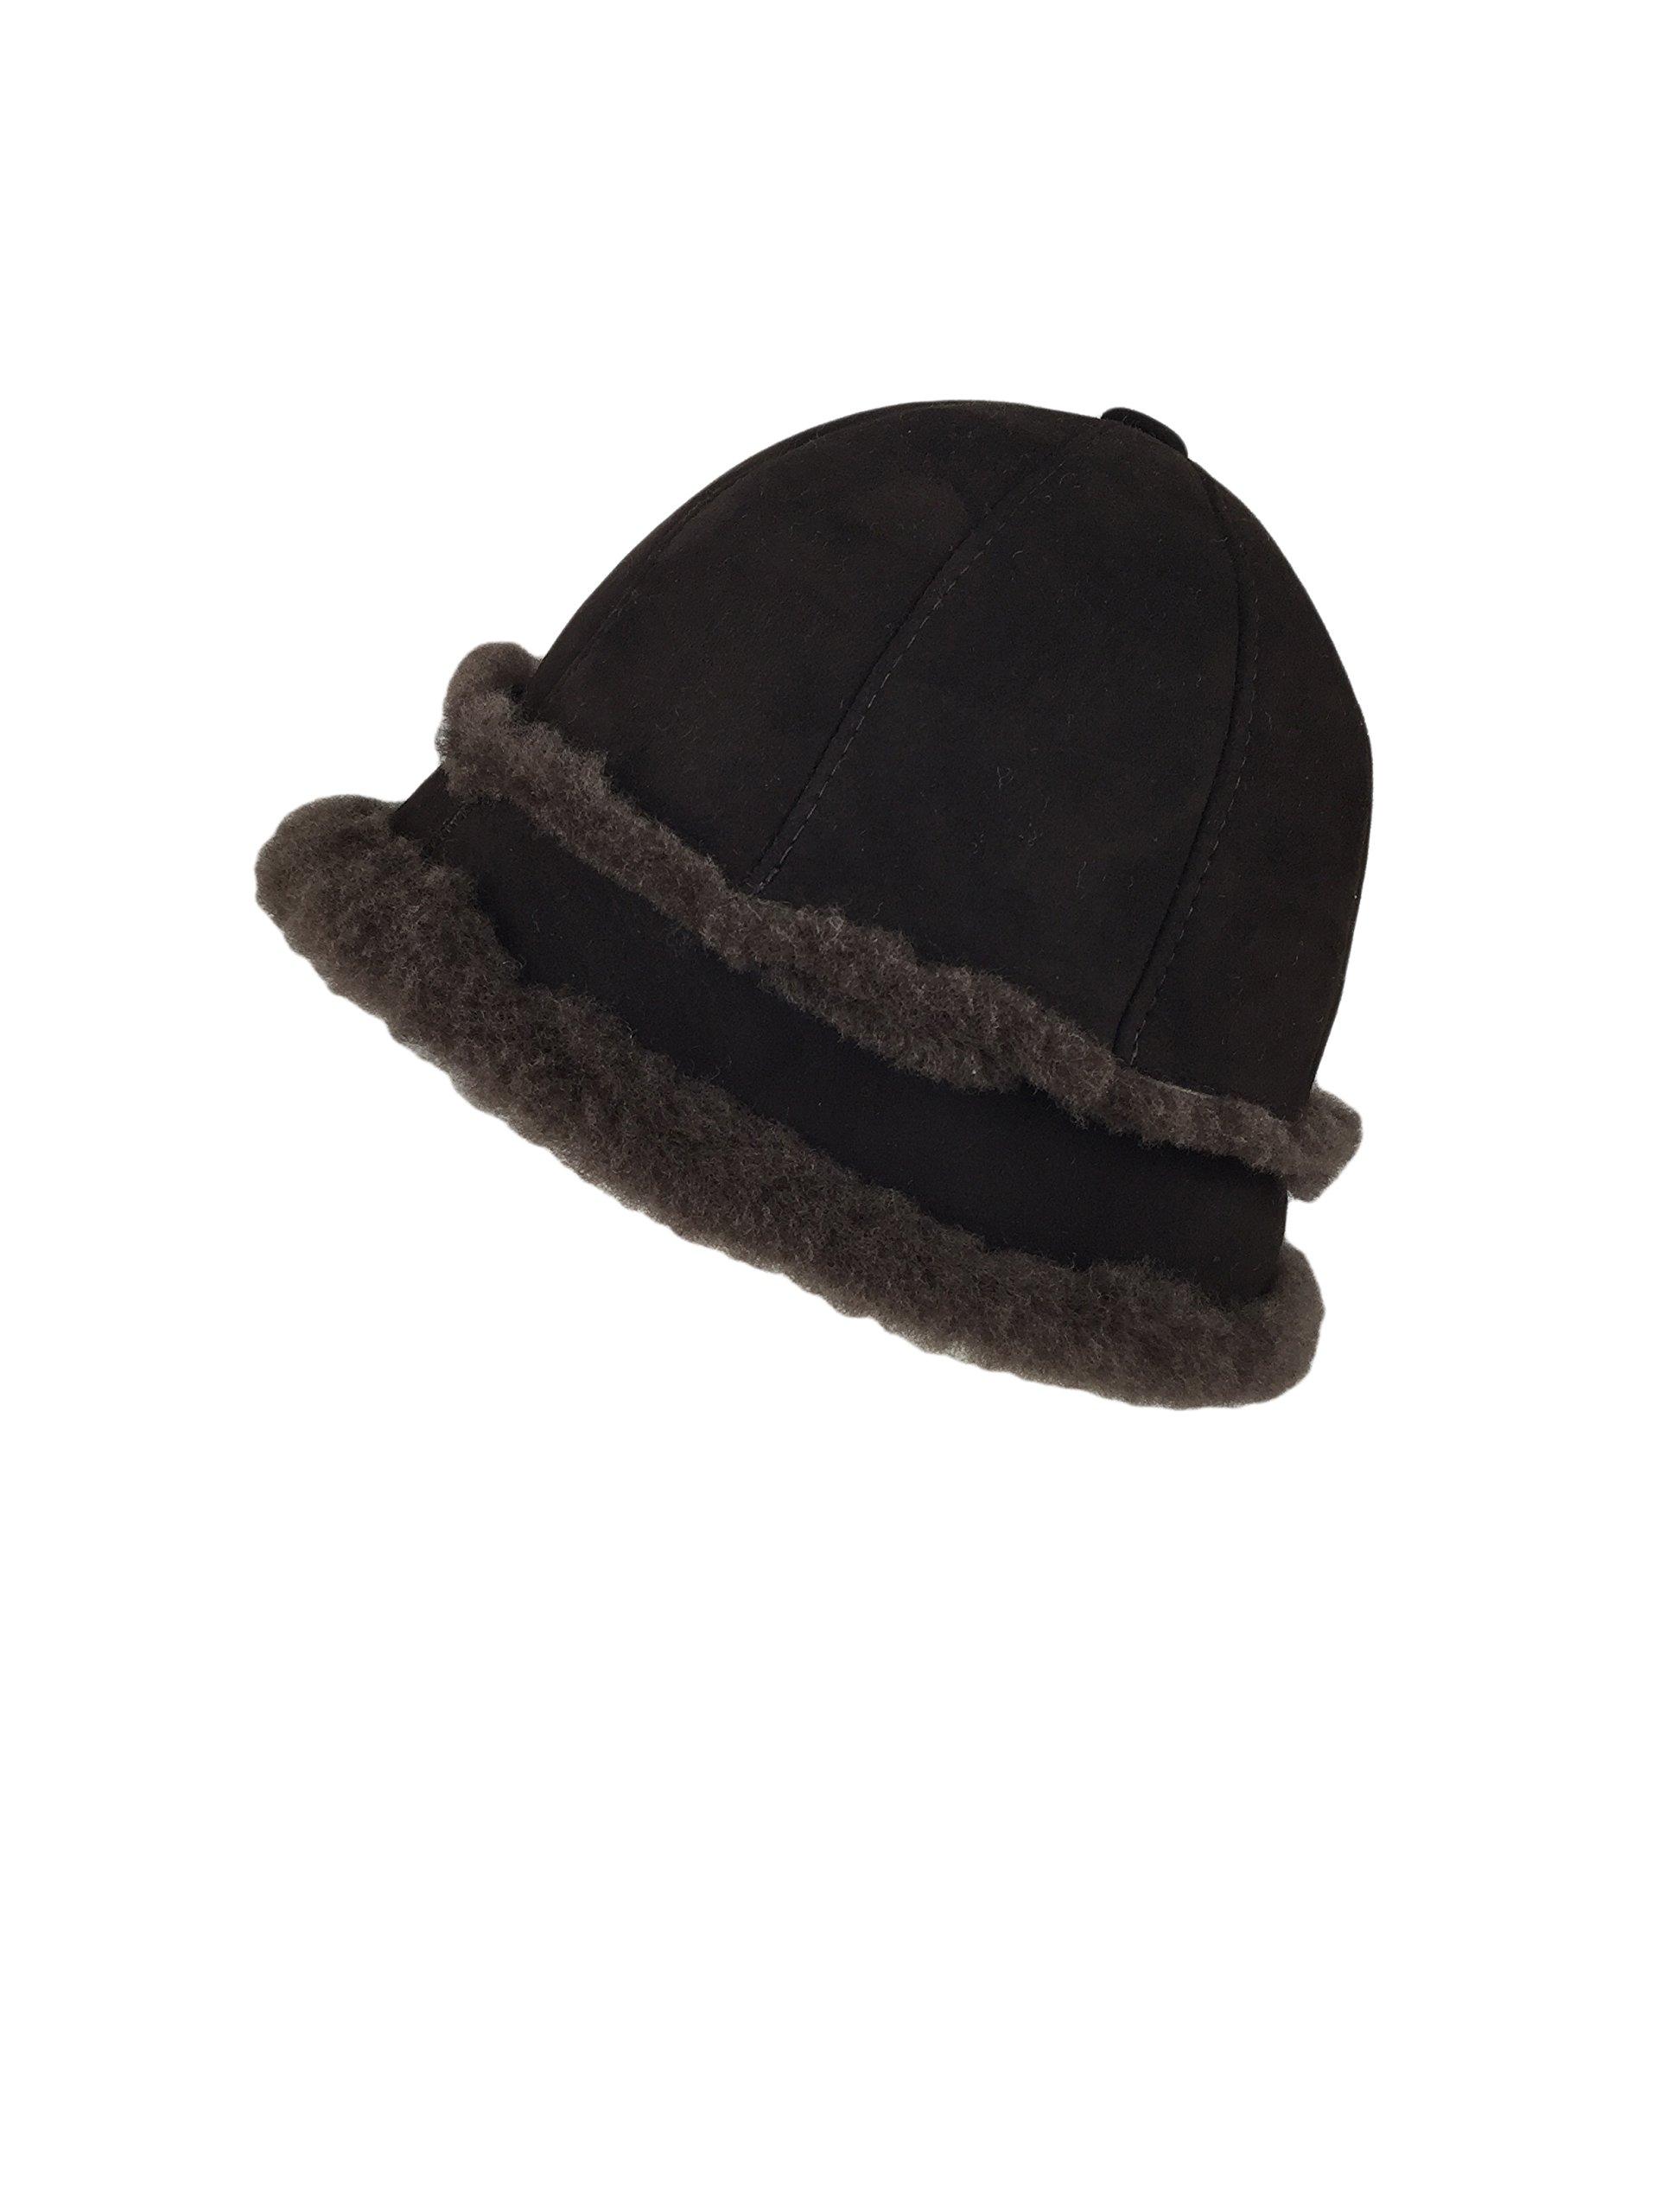 Zavelio Women's Shearling Sheepskin Winter Fur Bucket Beanie Hat Brown Suede M